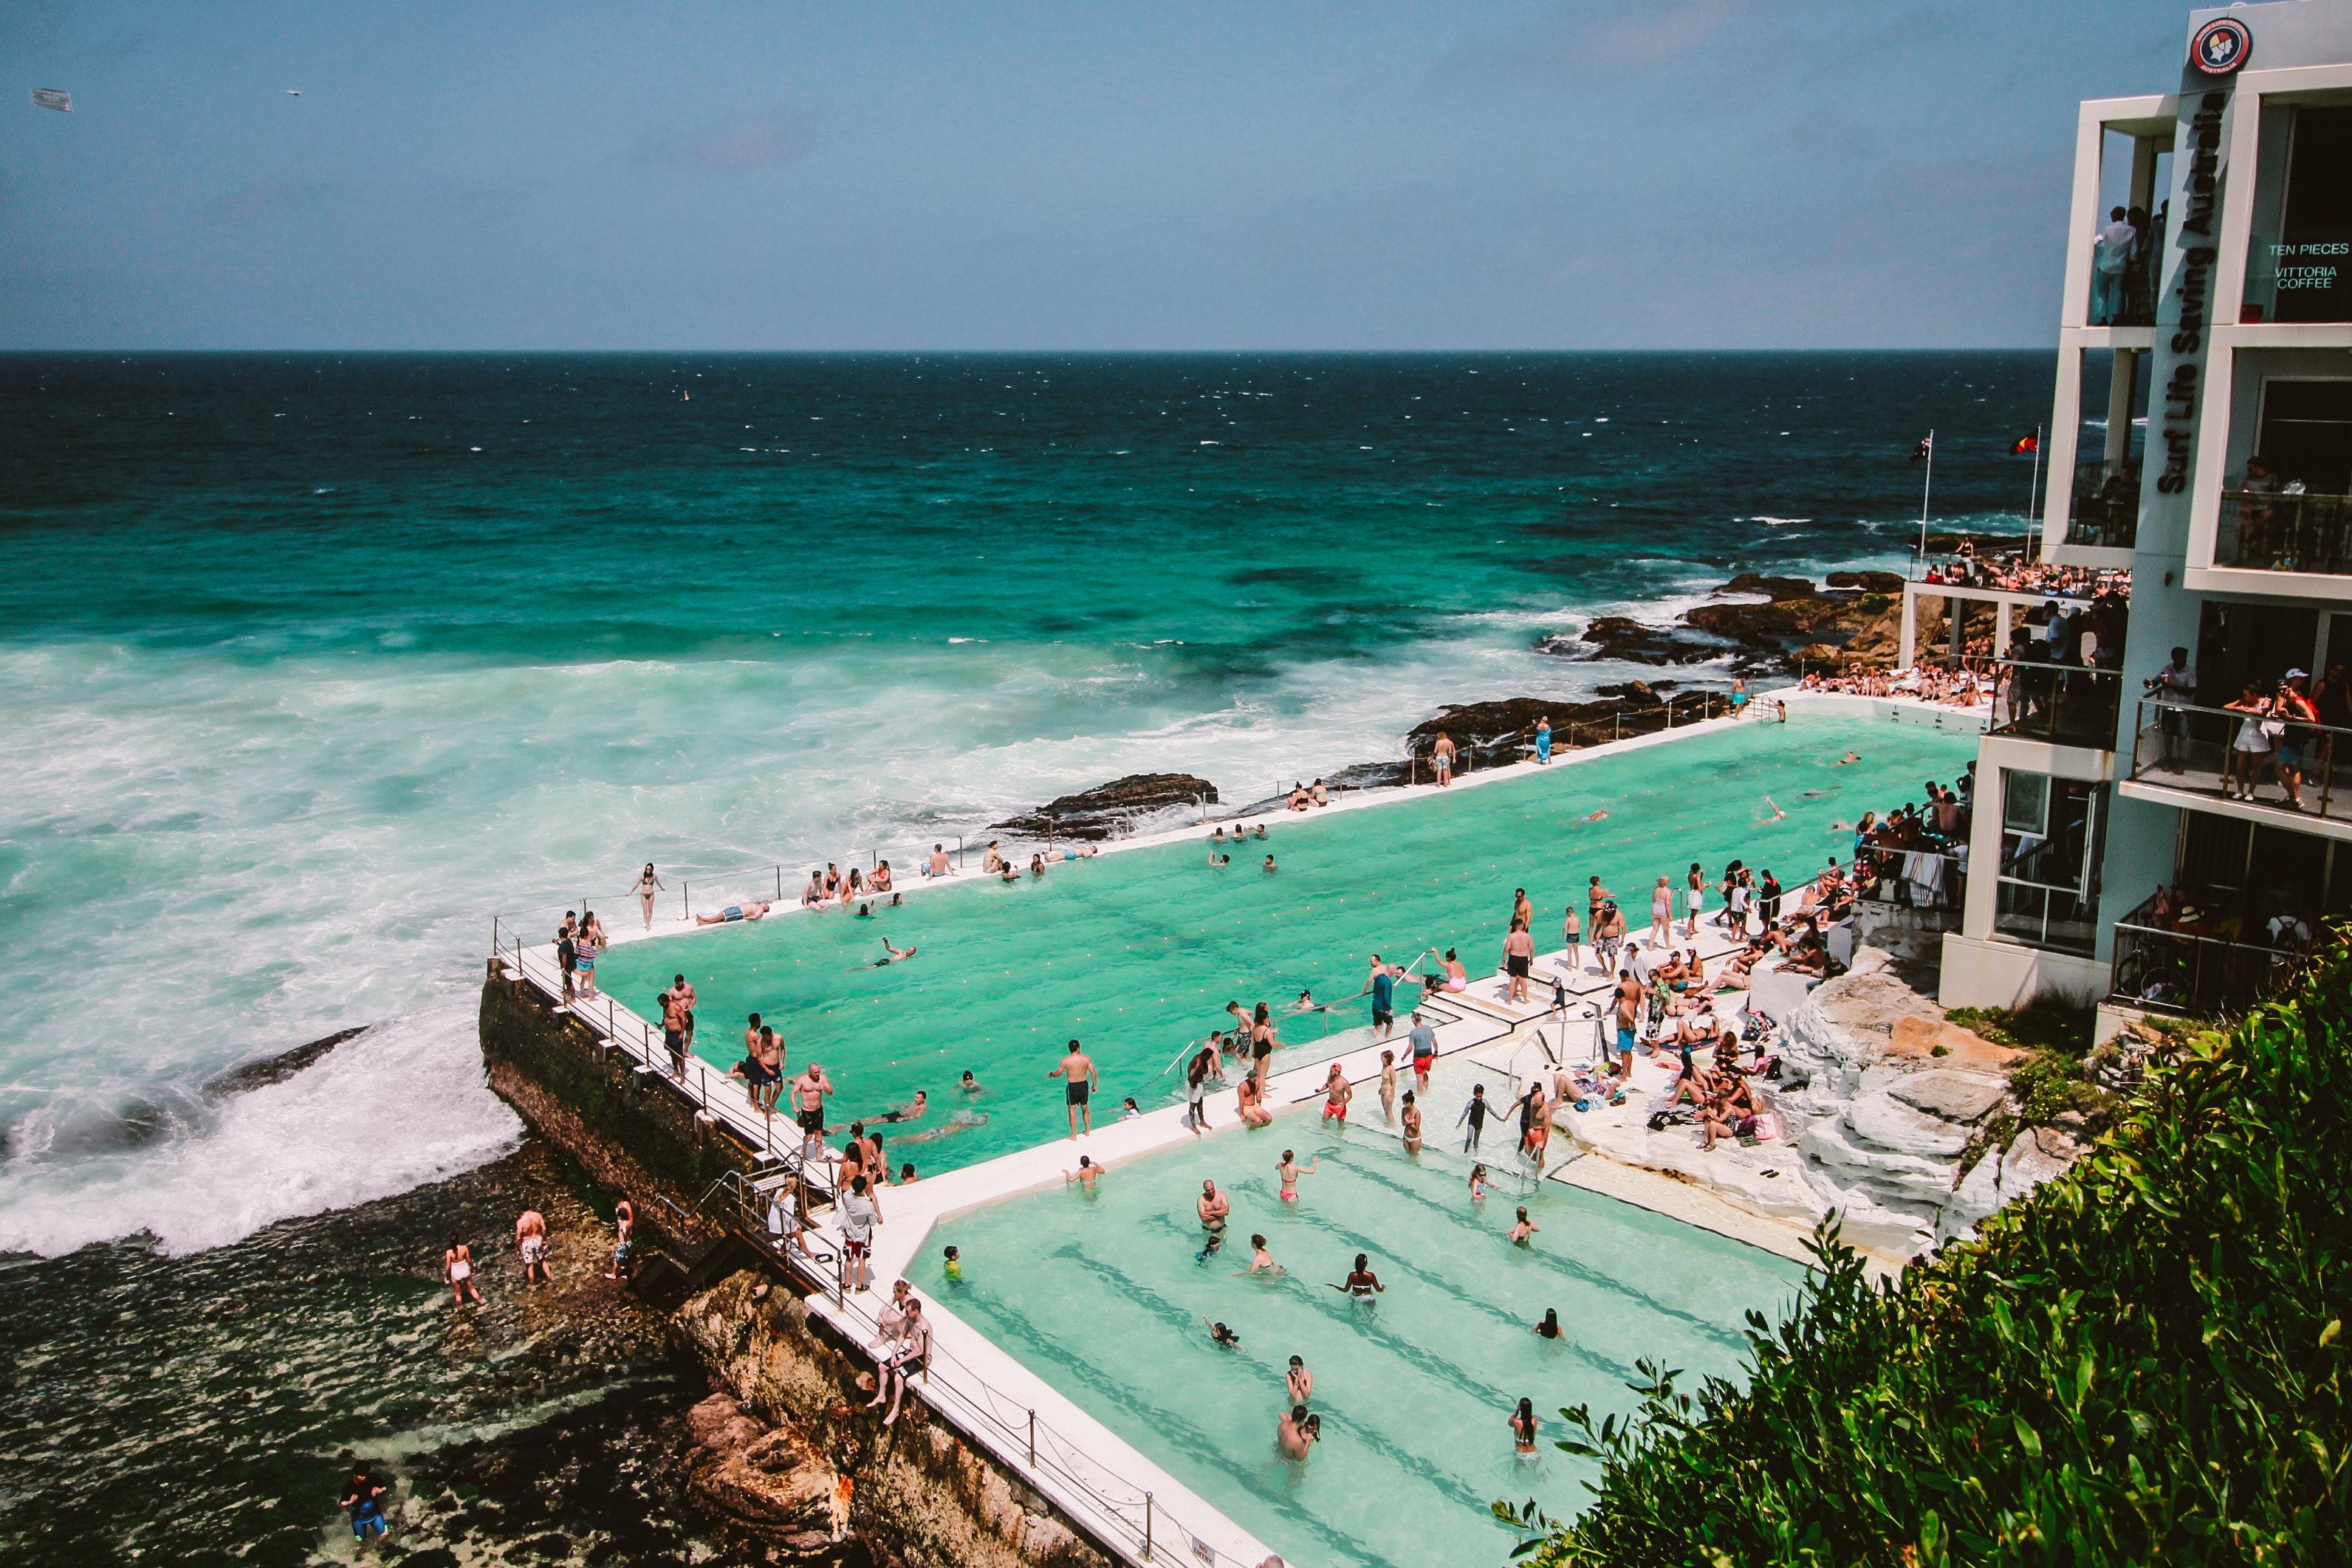 People gathering near swimming pool photo